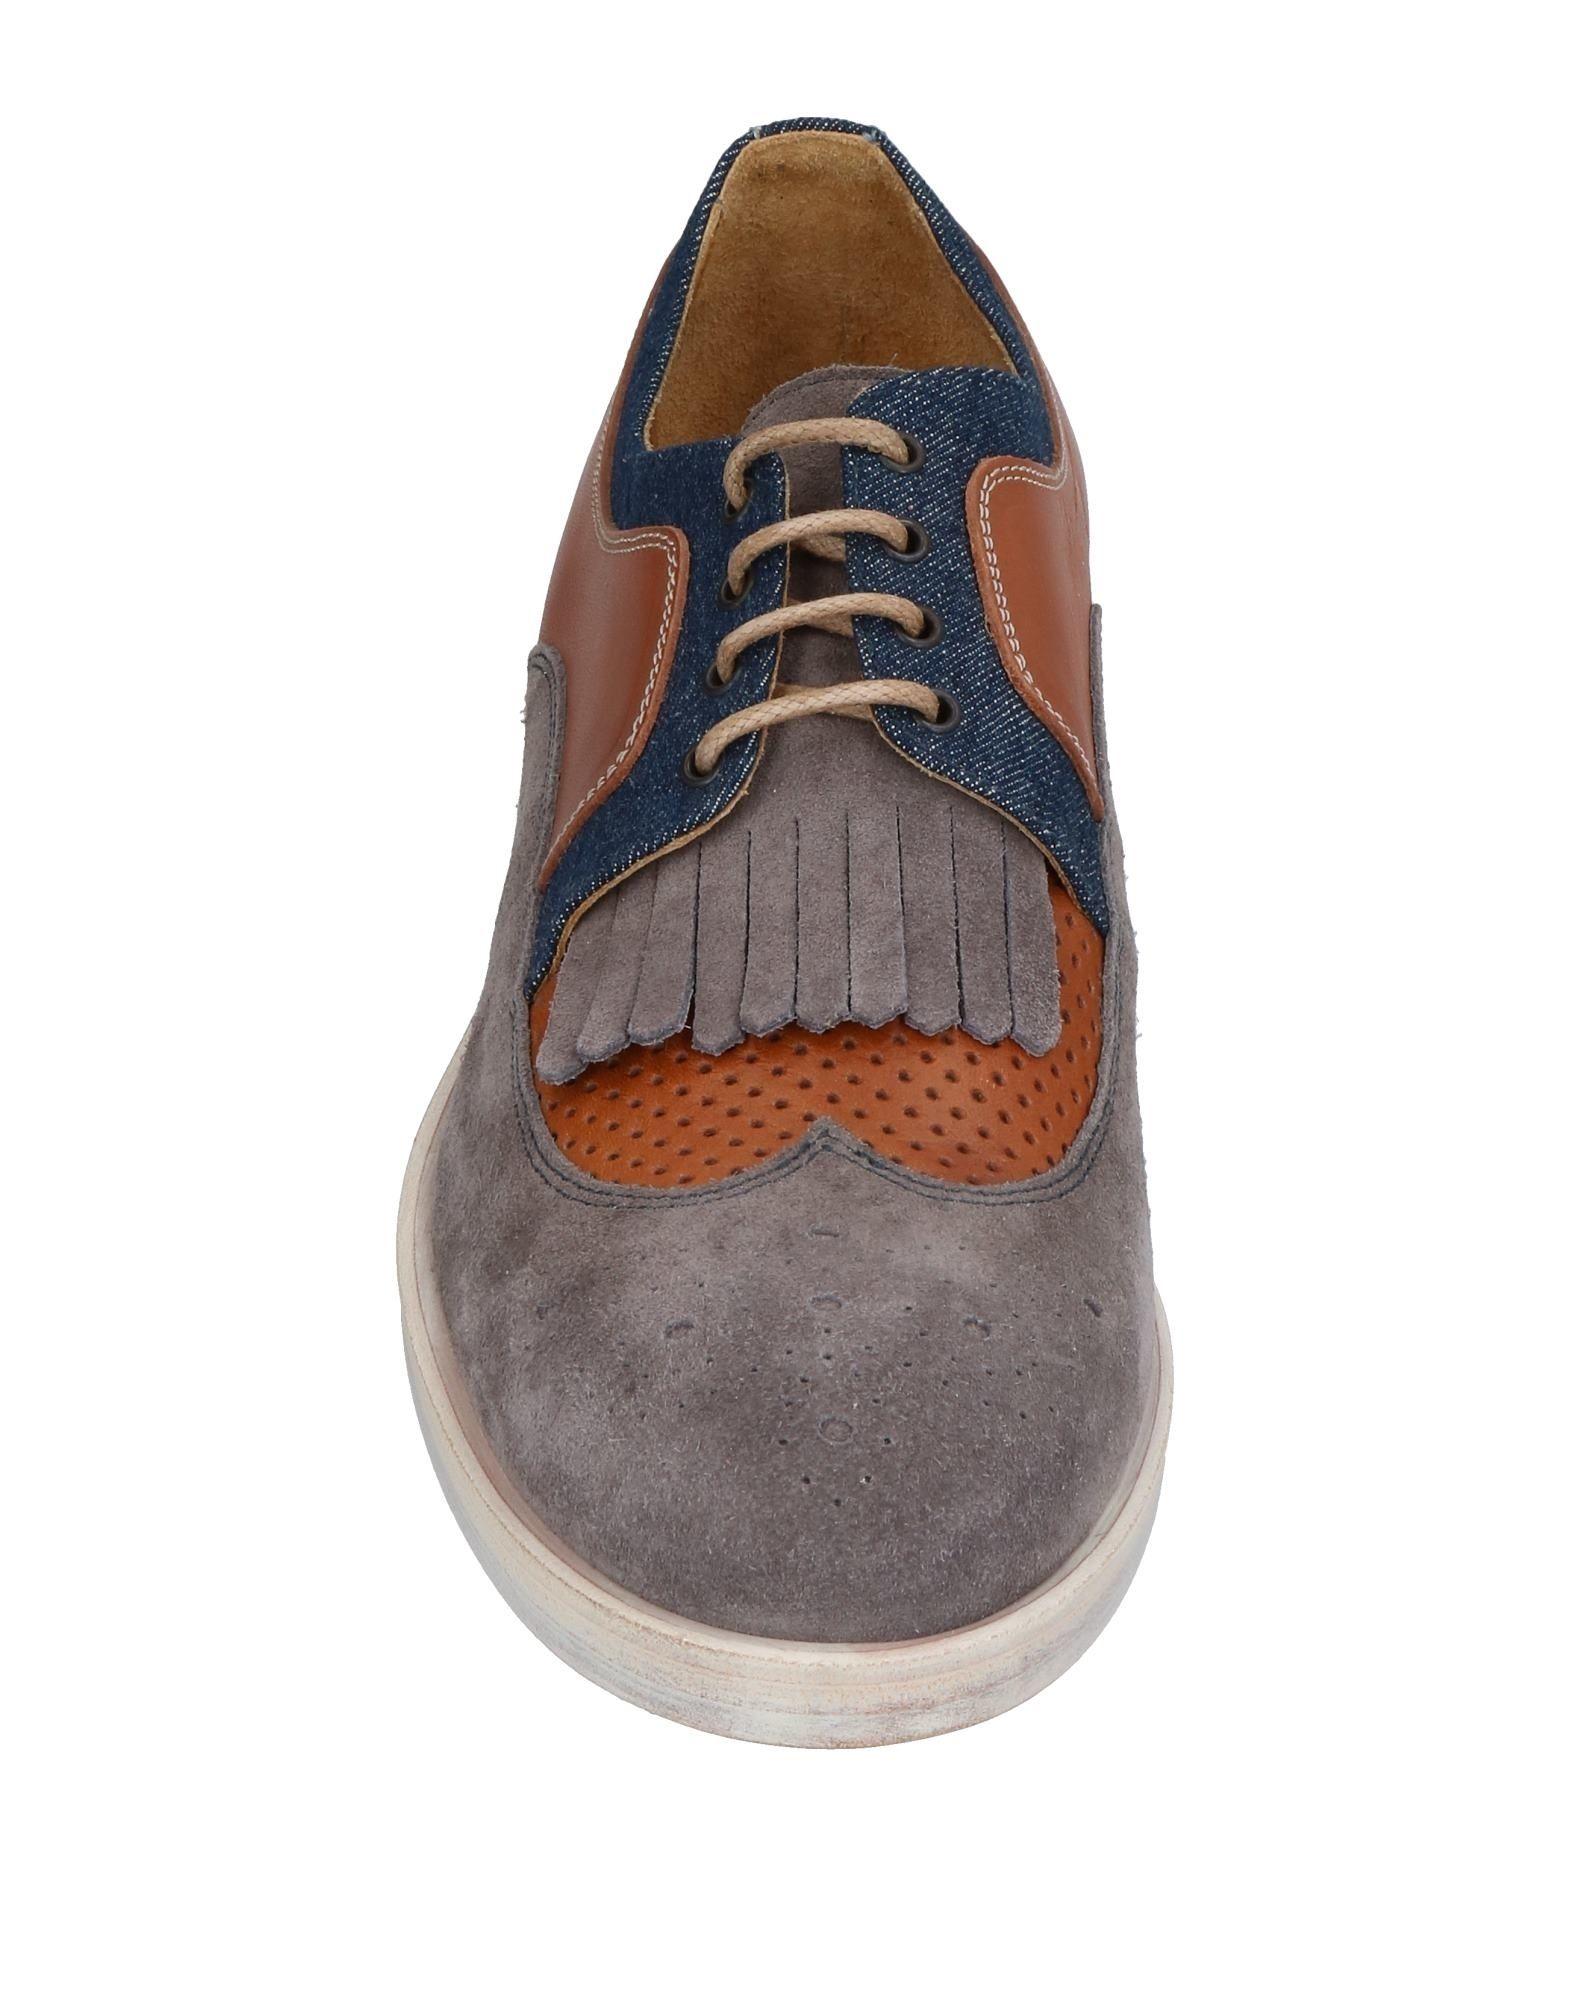 CHAUSSURES - Chaussures à lacetsHal iHuxXzz